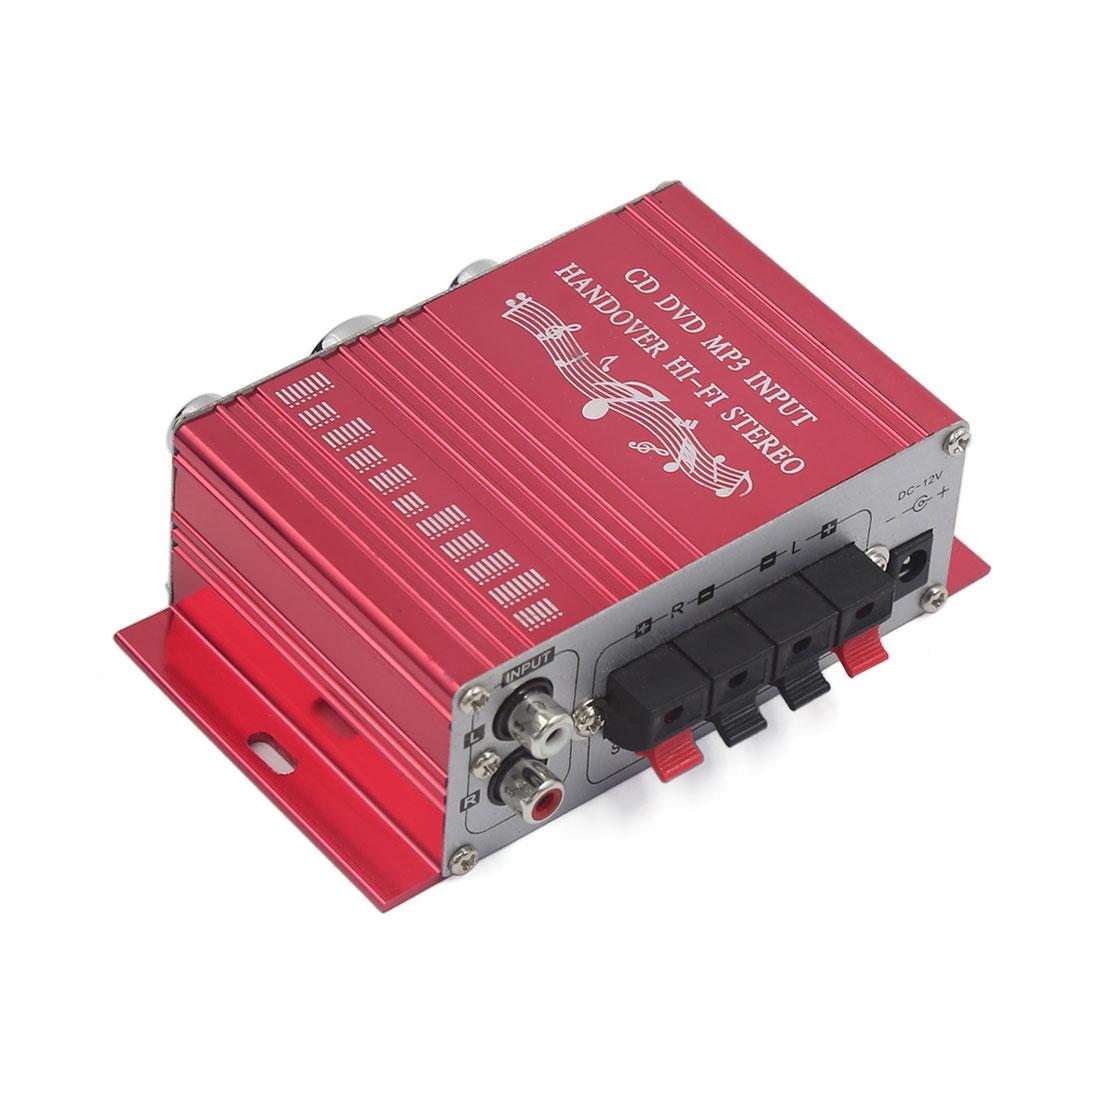 2-CH Mini Hi-Fi Car Boat Home Audio Stereo Amplifier CD DVD MP3 Player Red